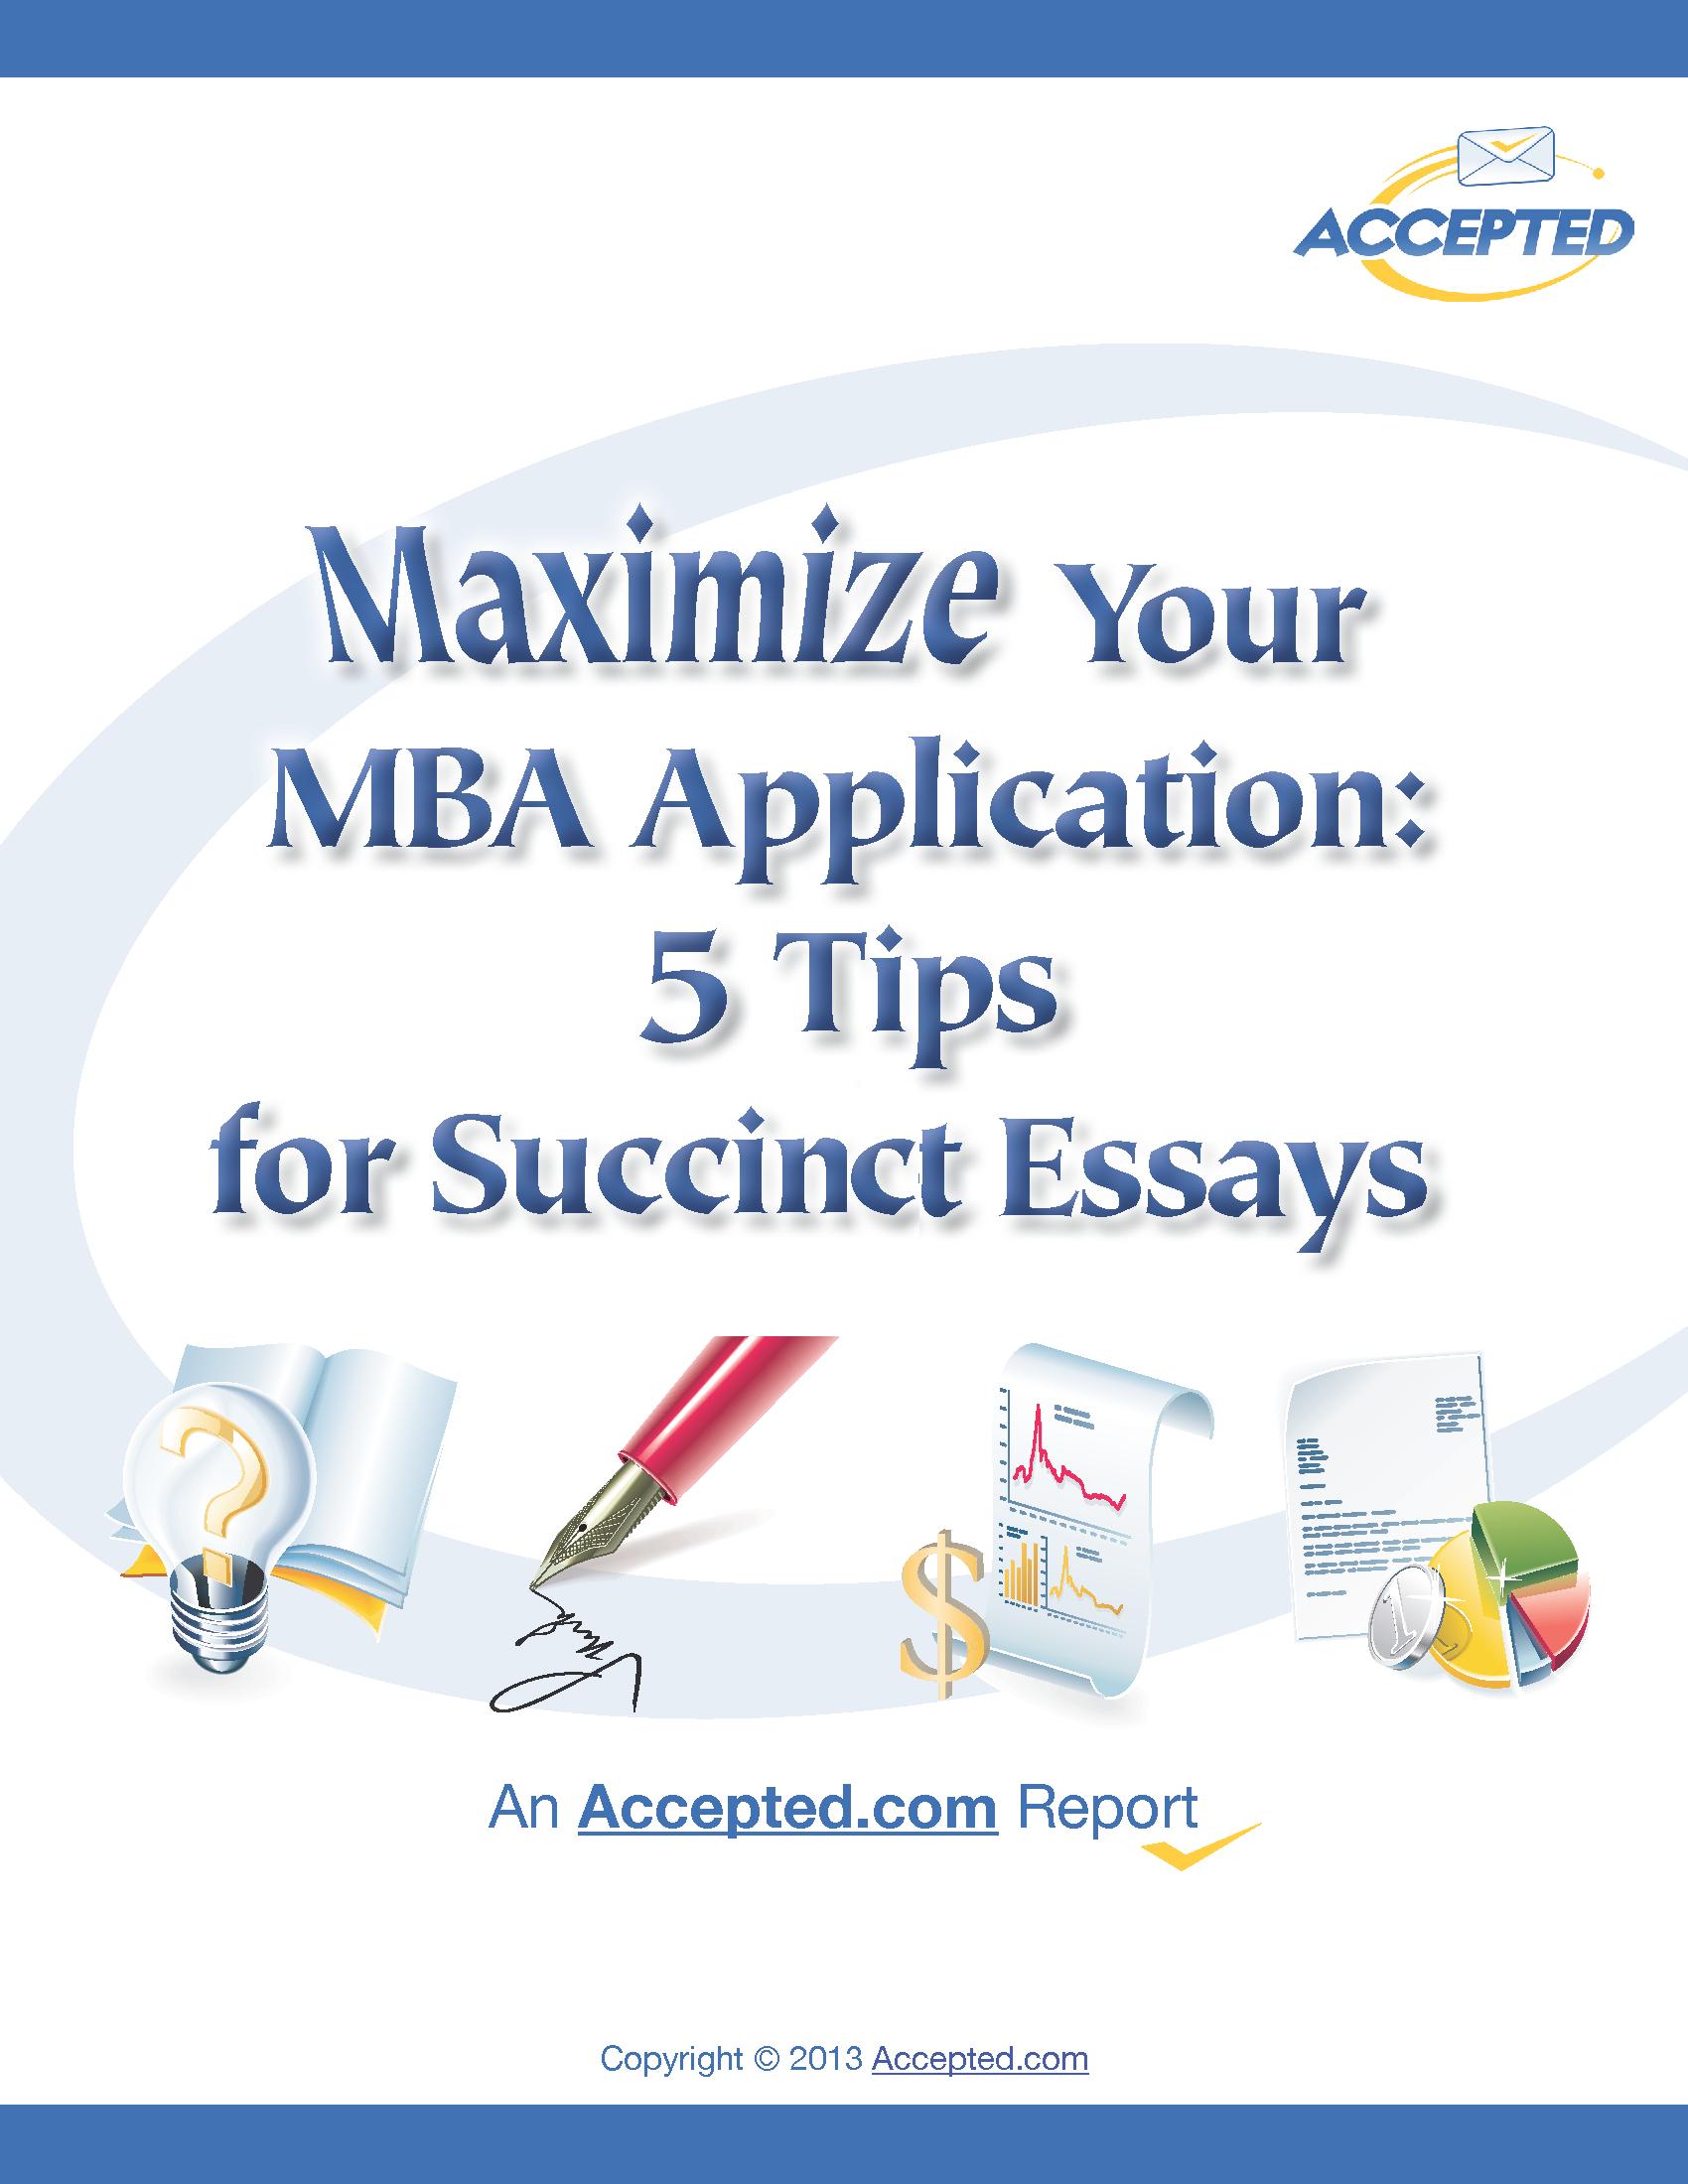 Admission Essay Writing Services - Custom Academic Writing